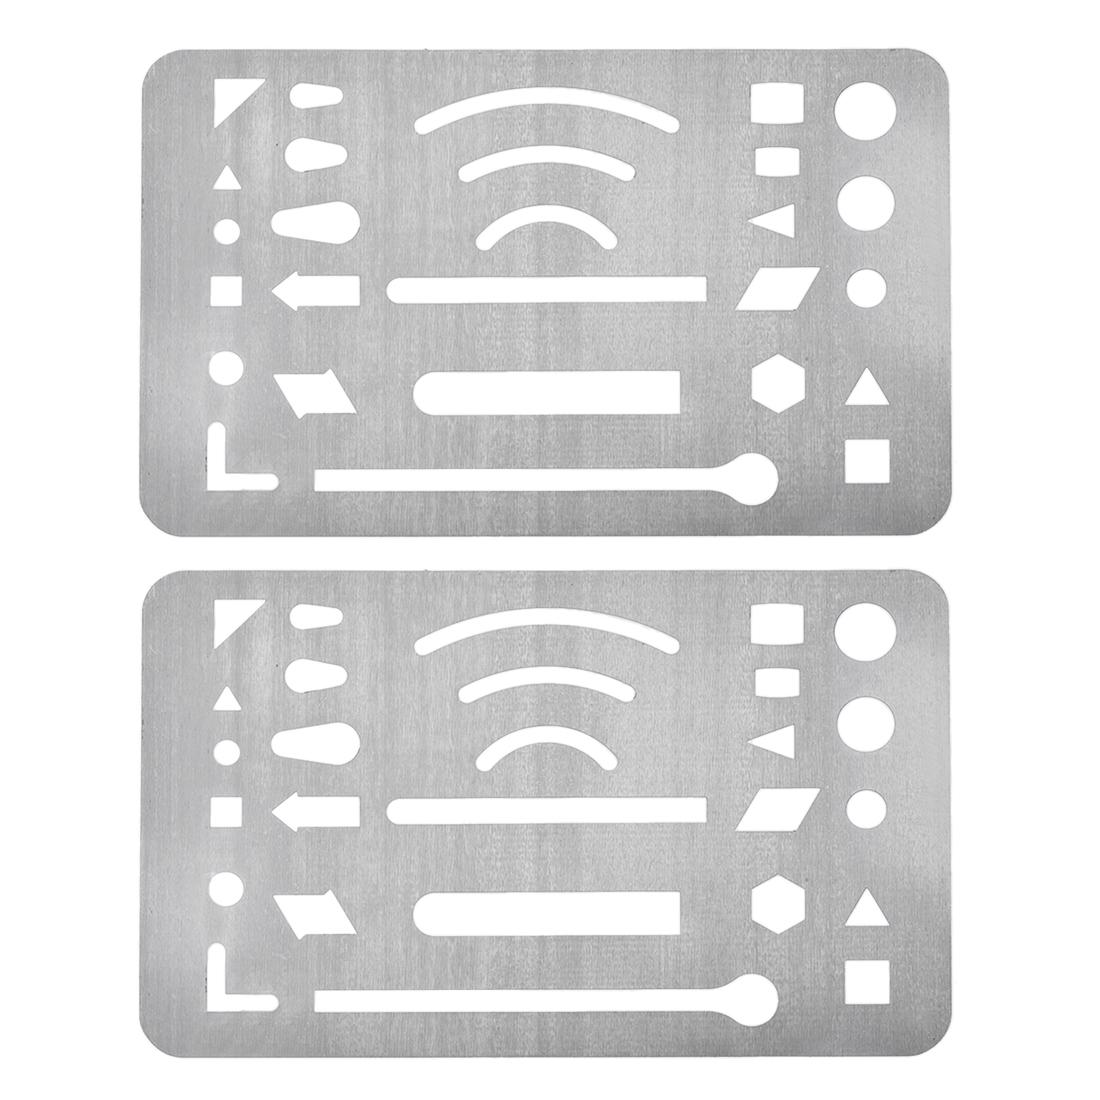 Erasing Shield 27 Patterns Stainless Steel Drawing Template 2pcs